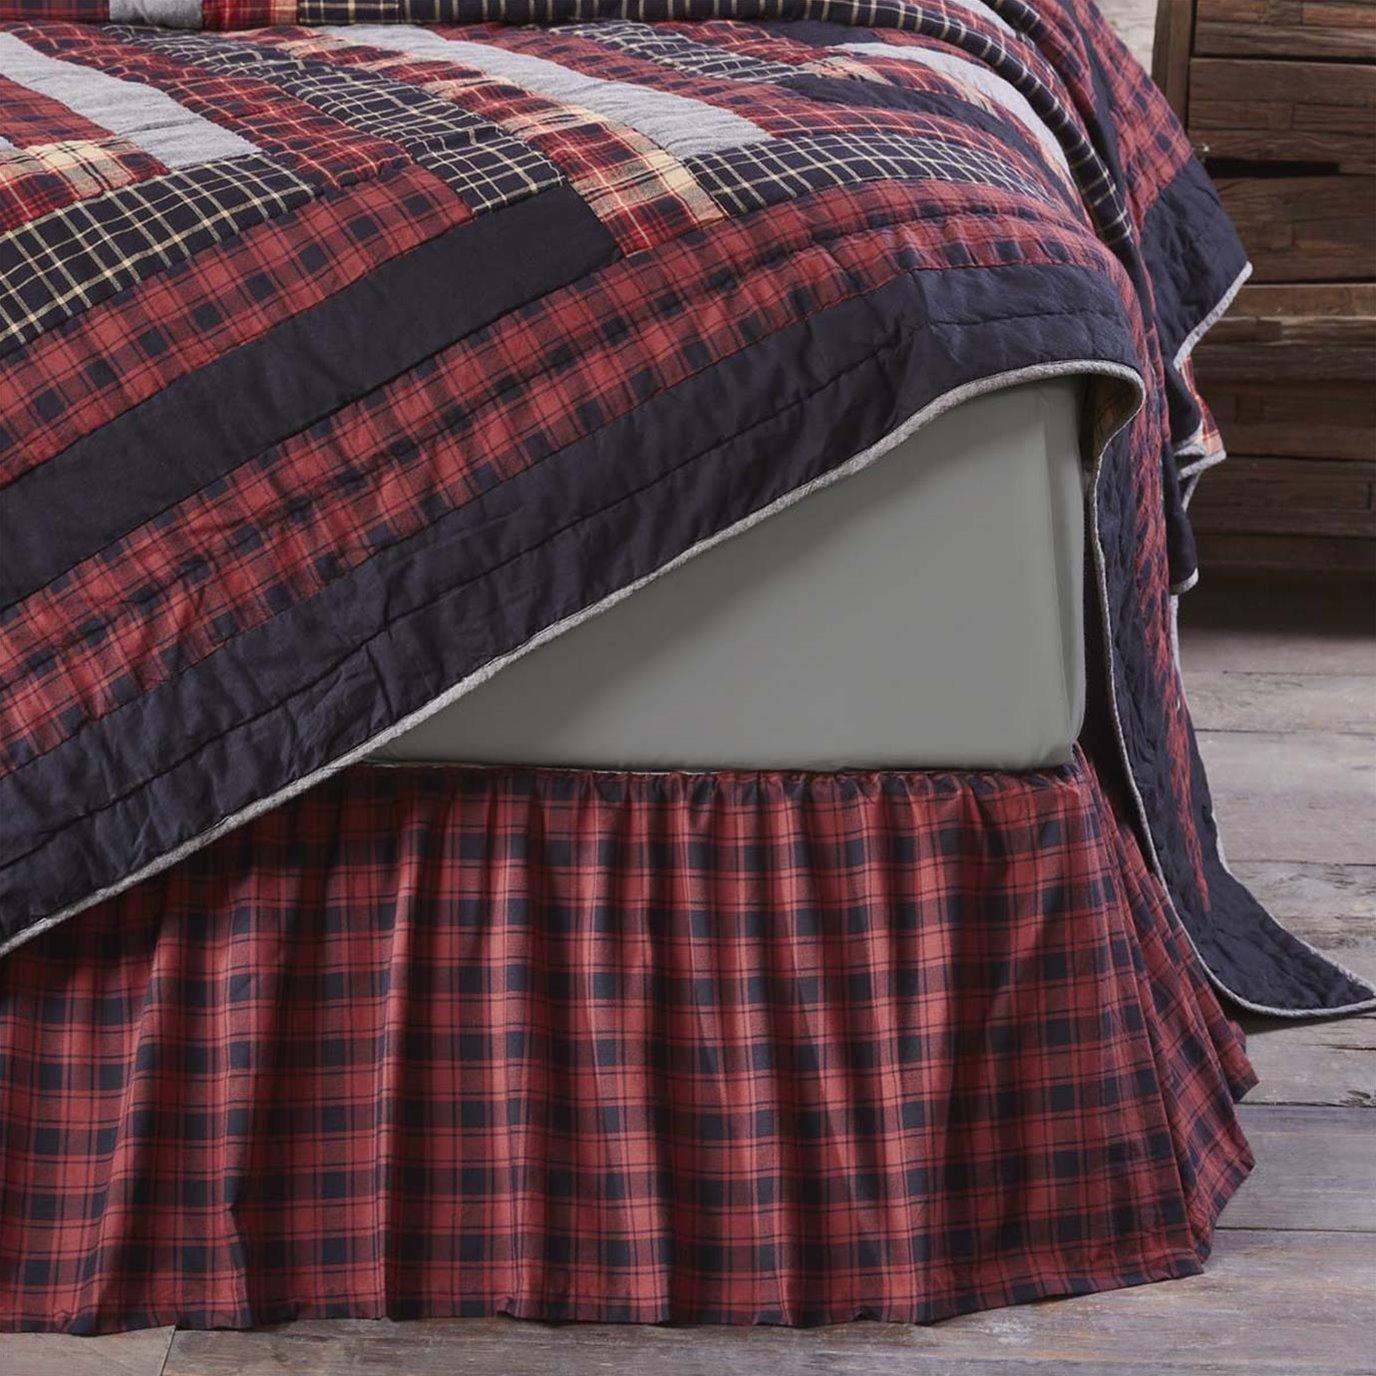 Cumberland King Bed Skirt 78x80x16